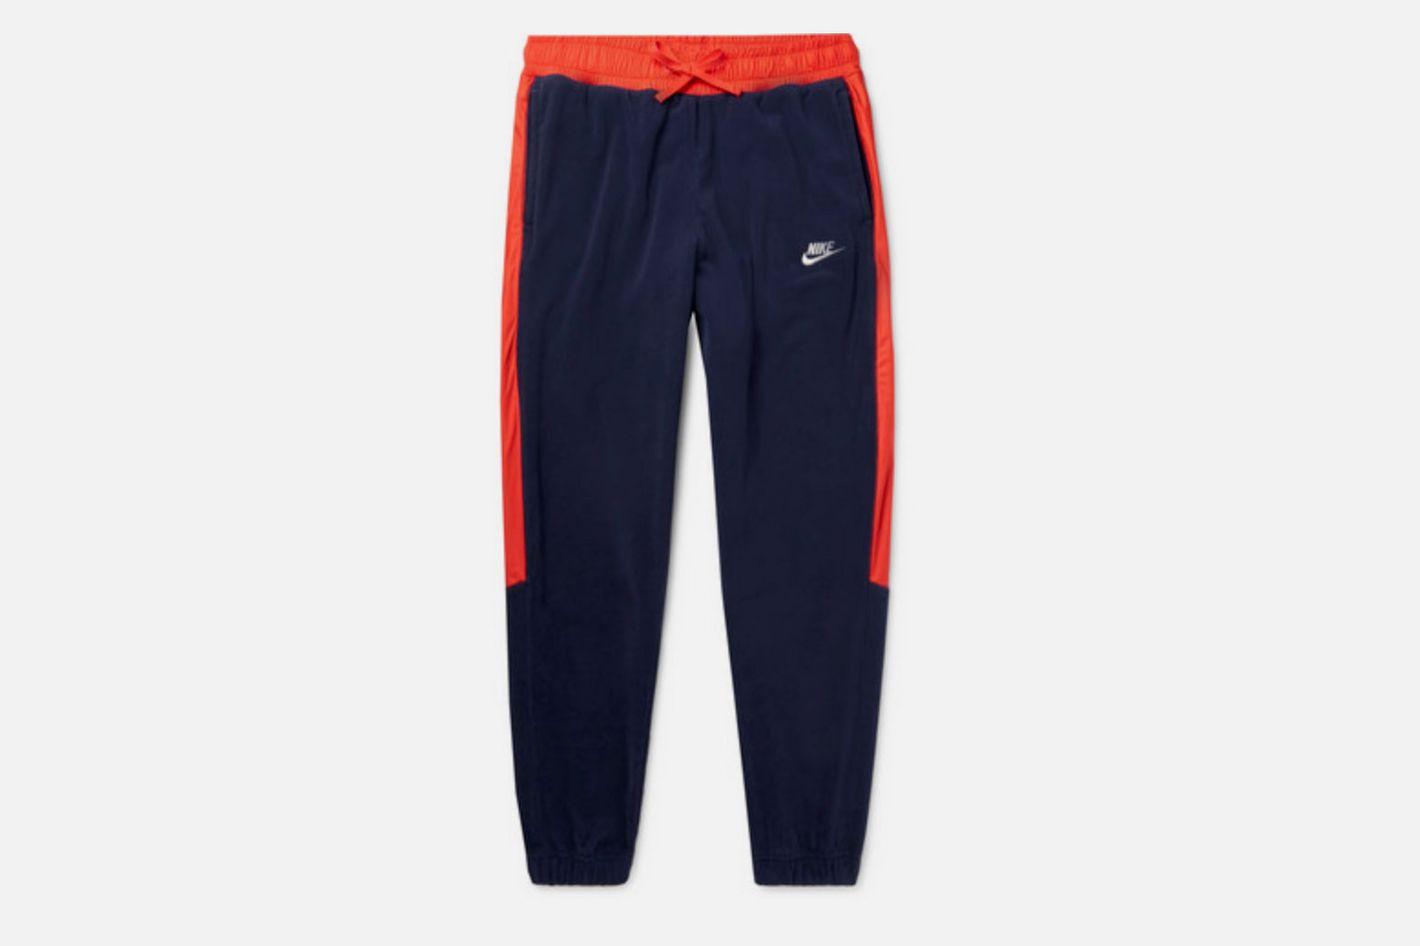 Nike Tapered Fleece Sweatpants